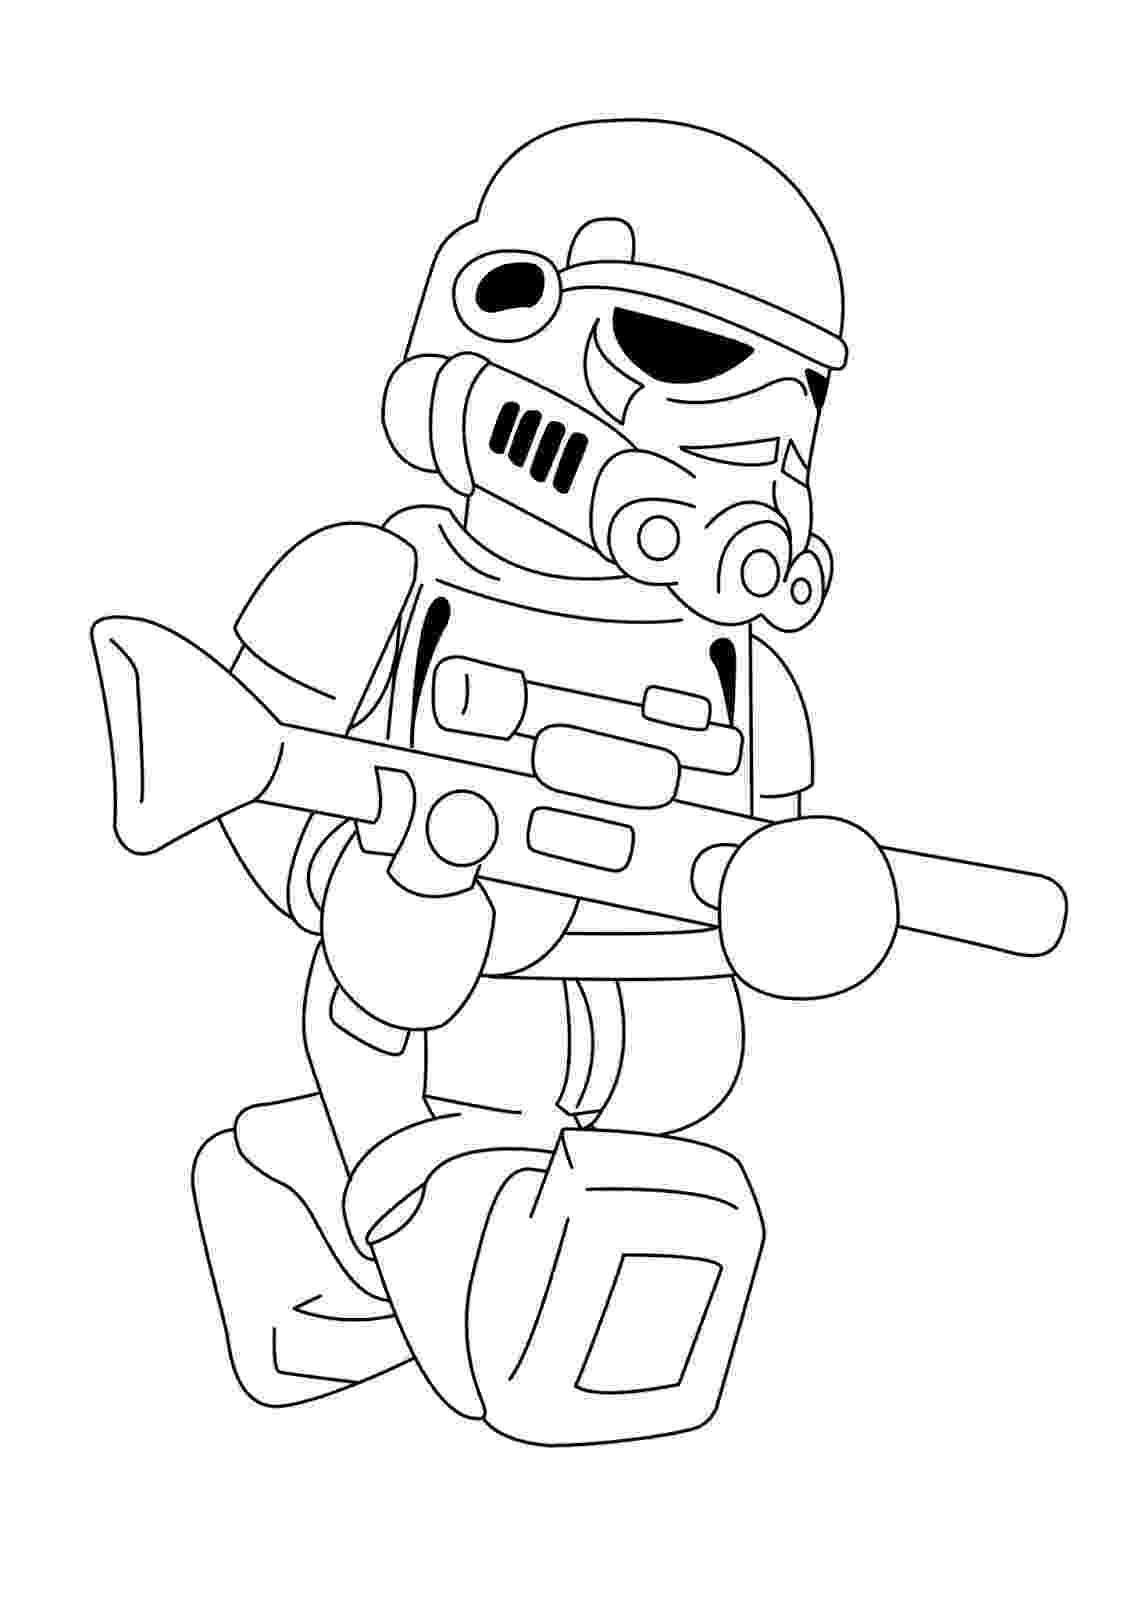 lego star wars color pages lego star wars coloring pages best coloring pages for kids pages star color wars lego